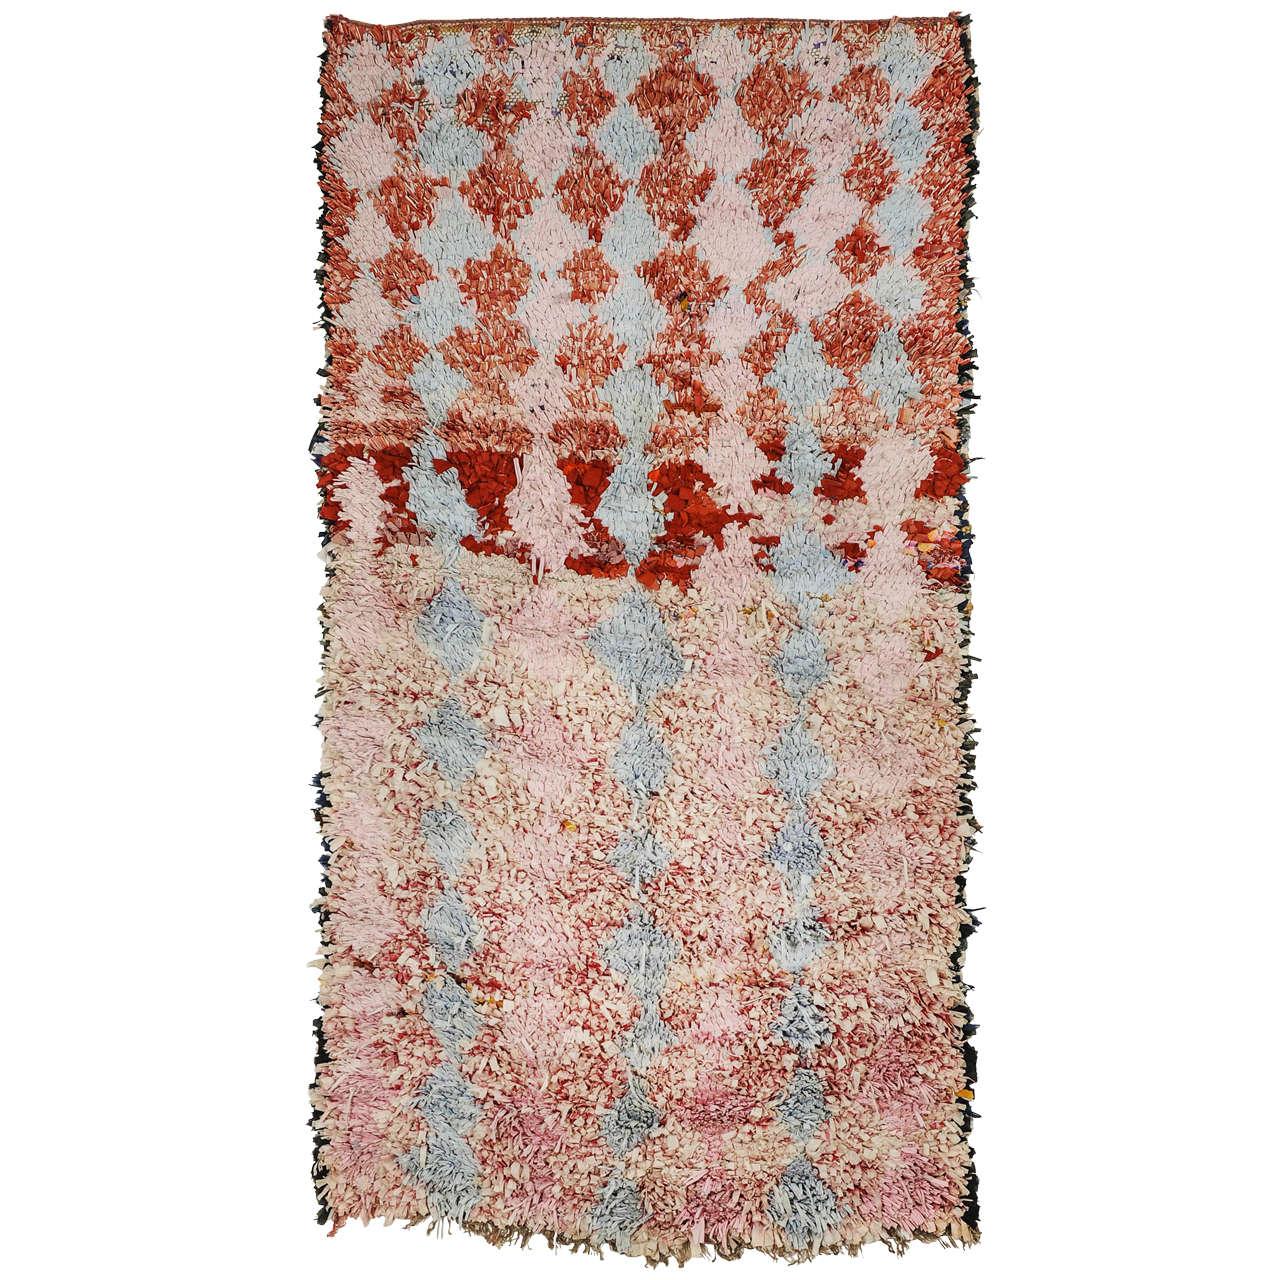 Moroccan Boucherouite Rug For Sale At 1stdibs: Berber Boucherouite Carpet At 1stdibs